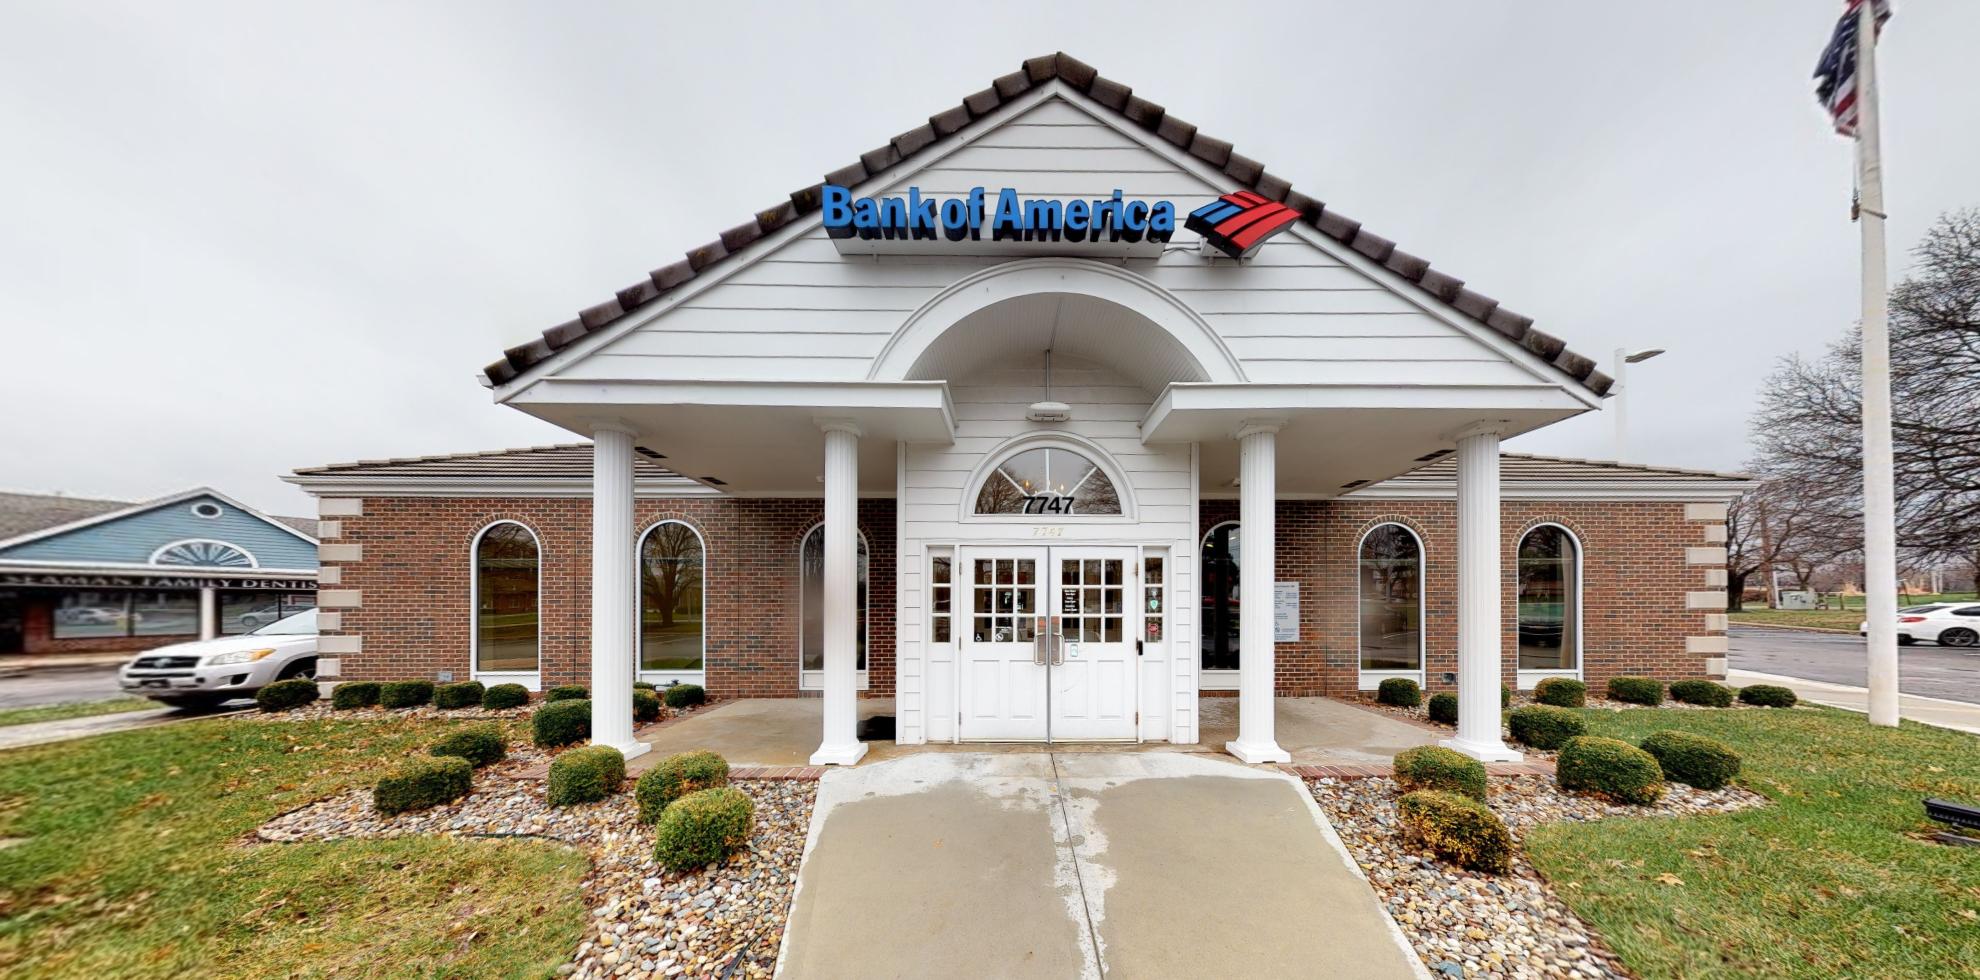 Bank of America financial center with drive-thru ATM | 7747 Quivira Rd, Lenexa, KS 66216